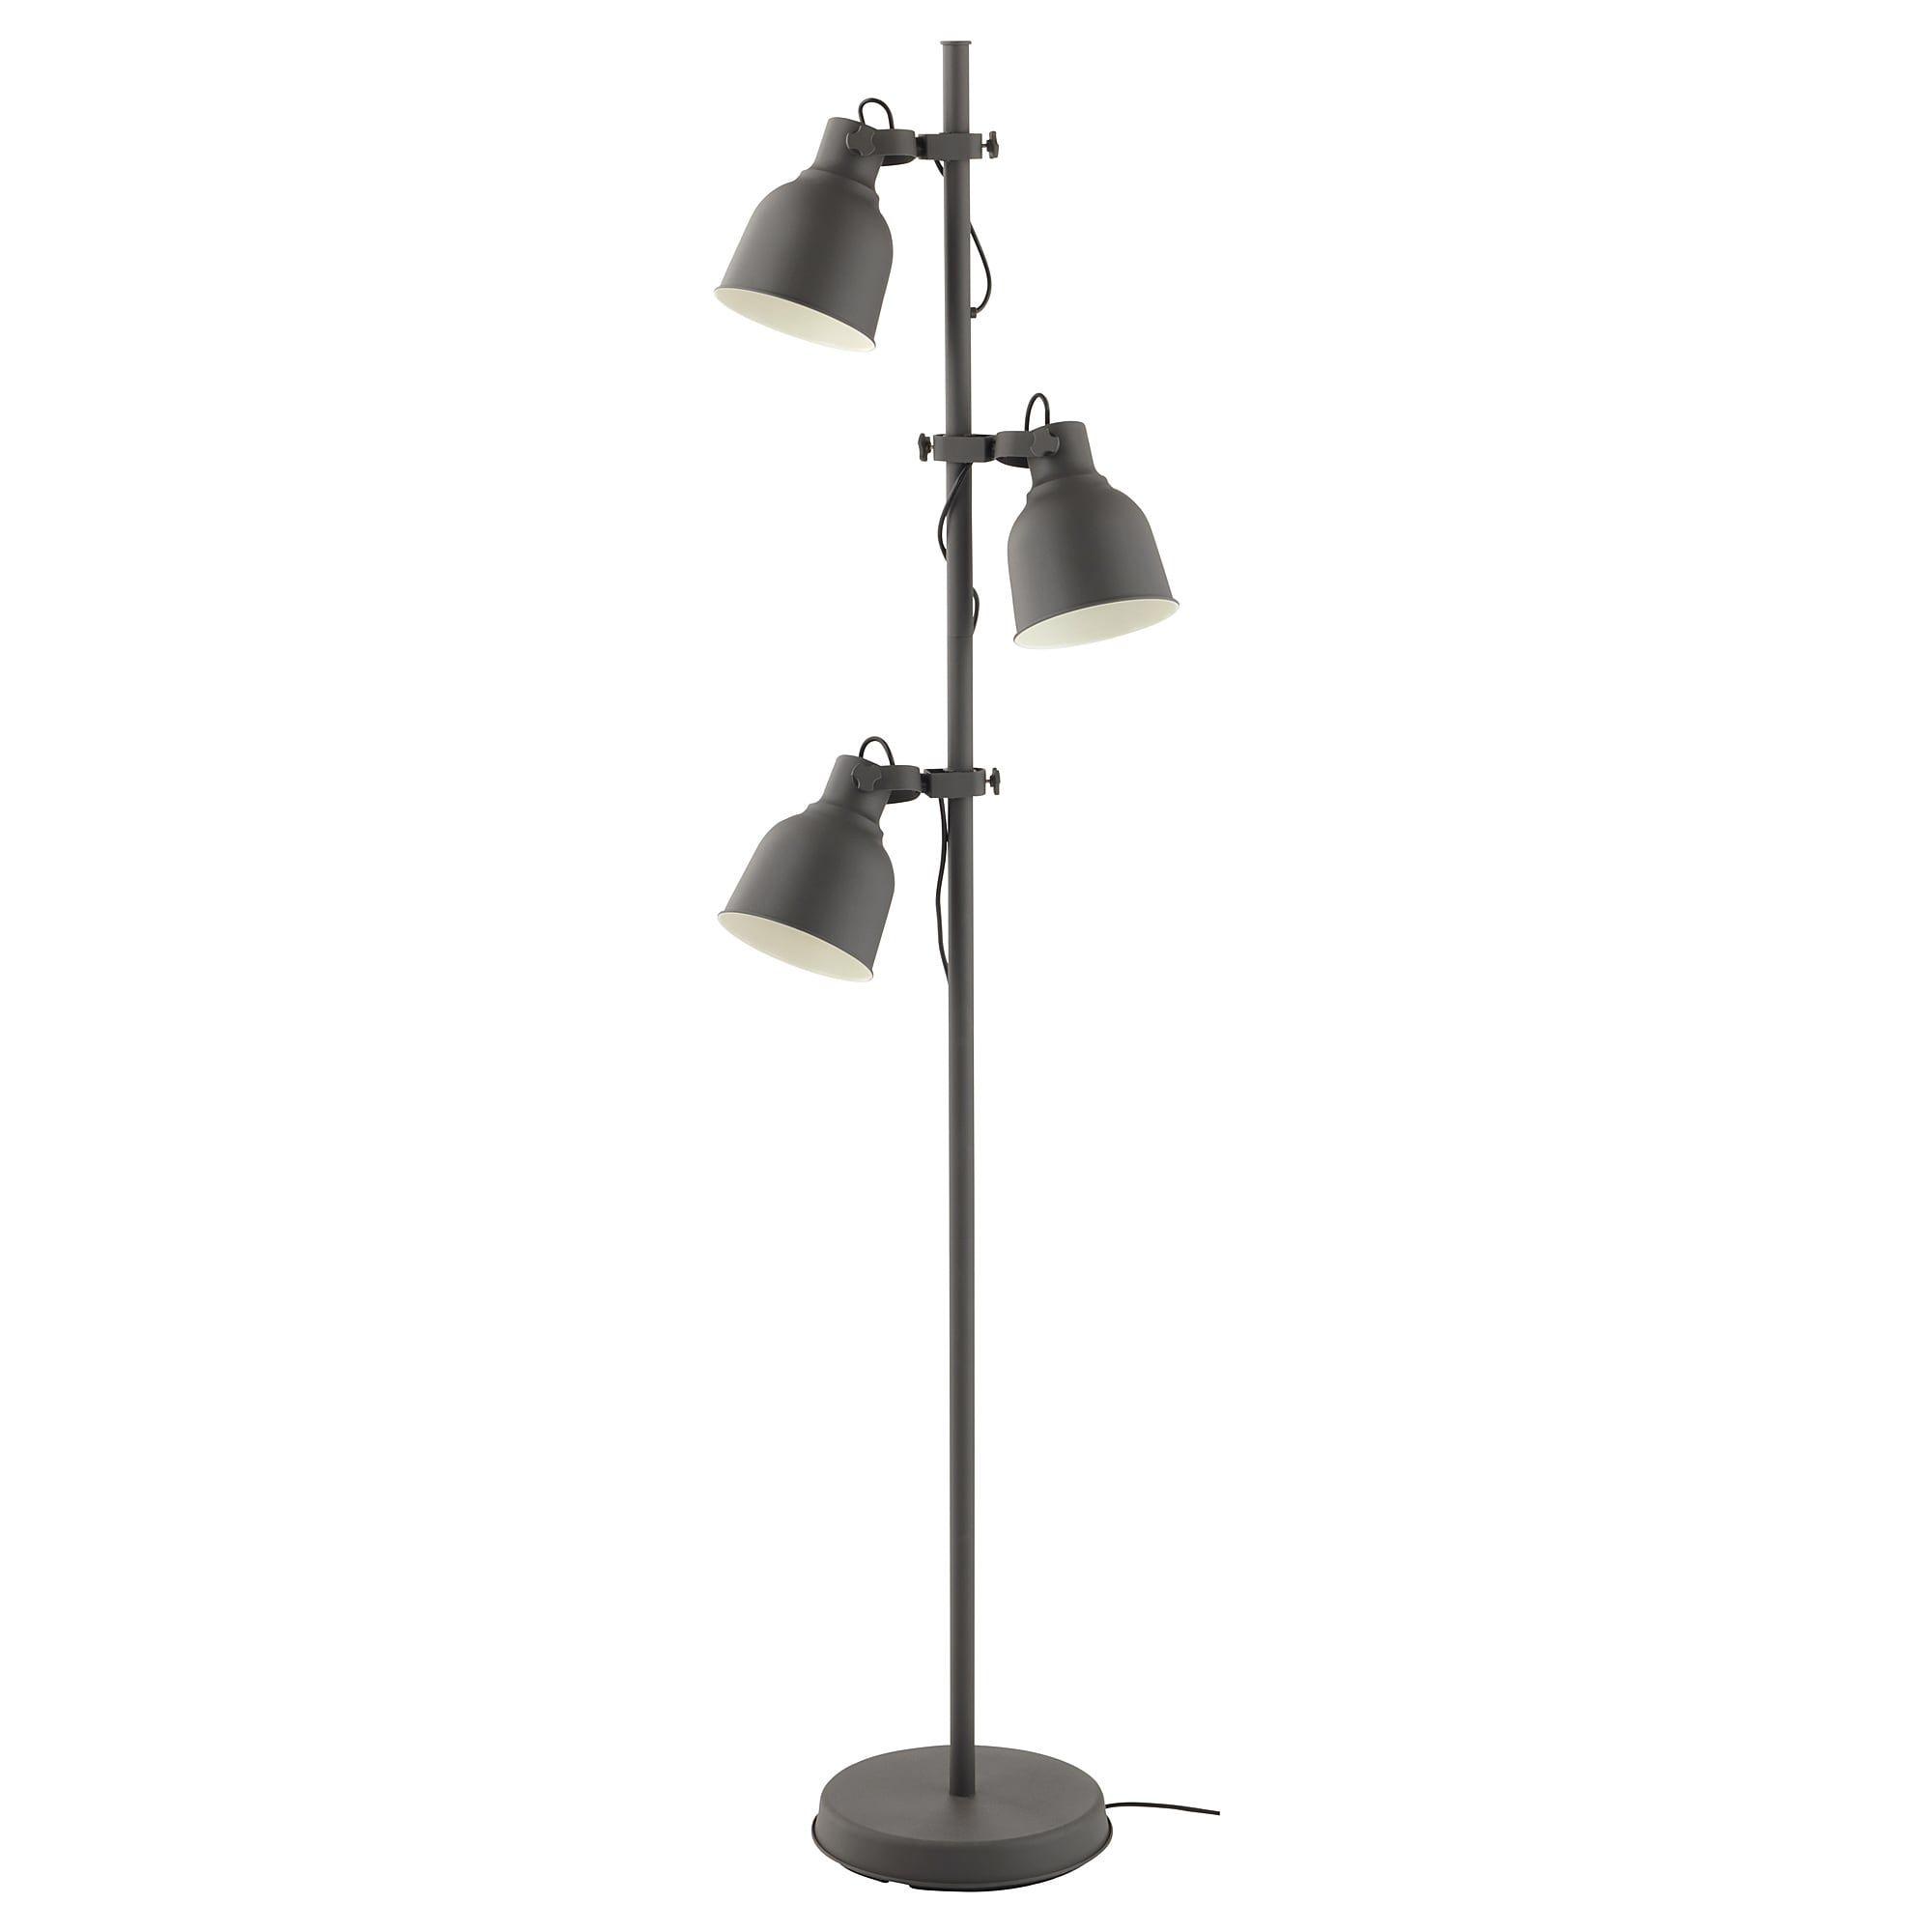 Hektar Floor Lamp W 3 Spots And Led Bulbs Dark Gray Lampen